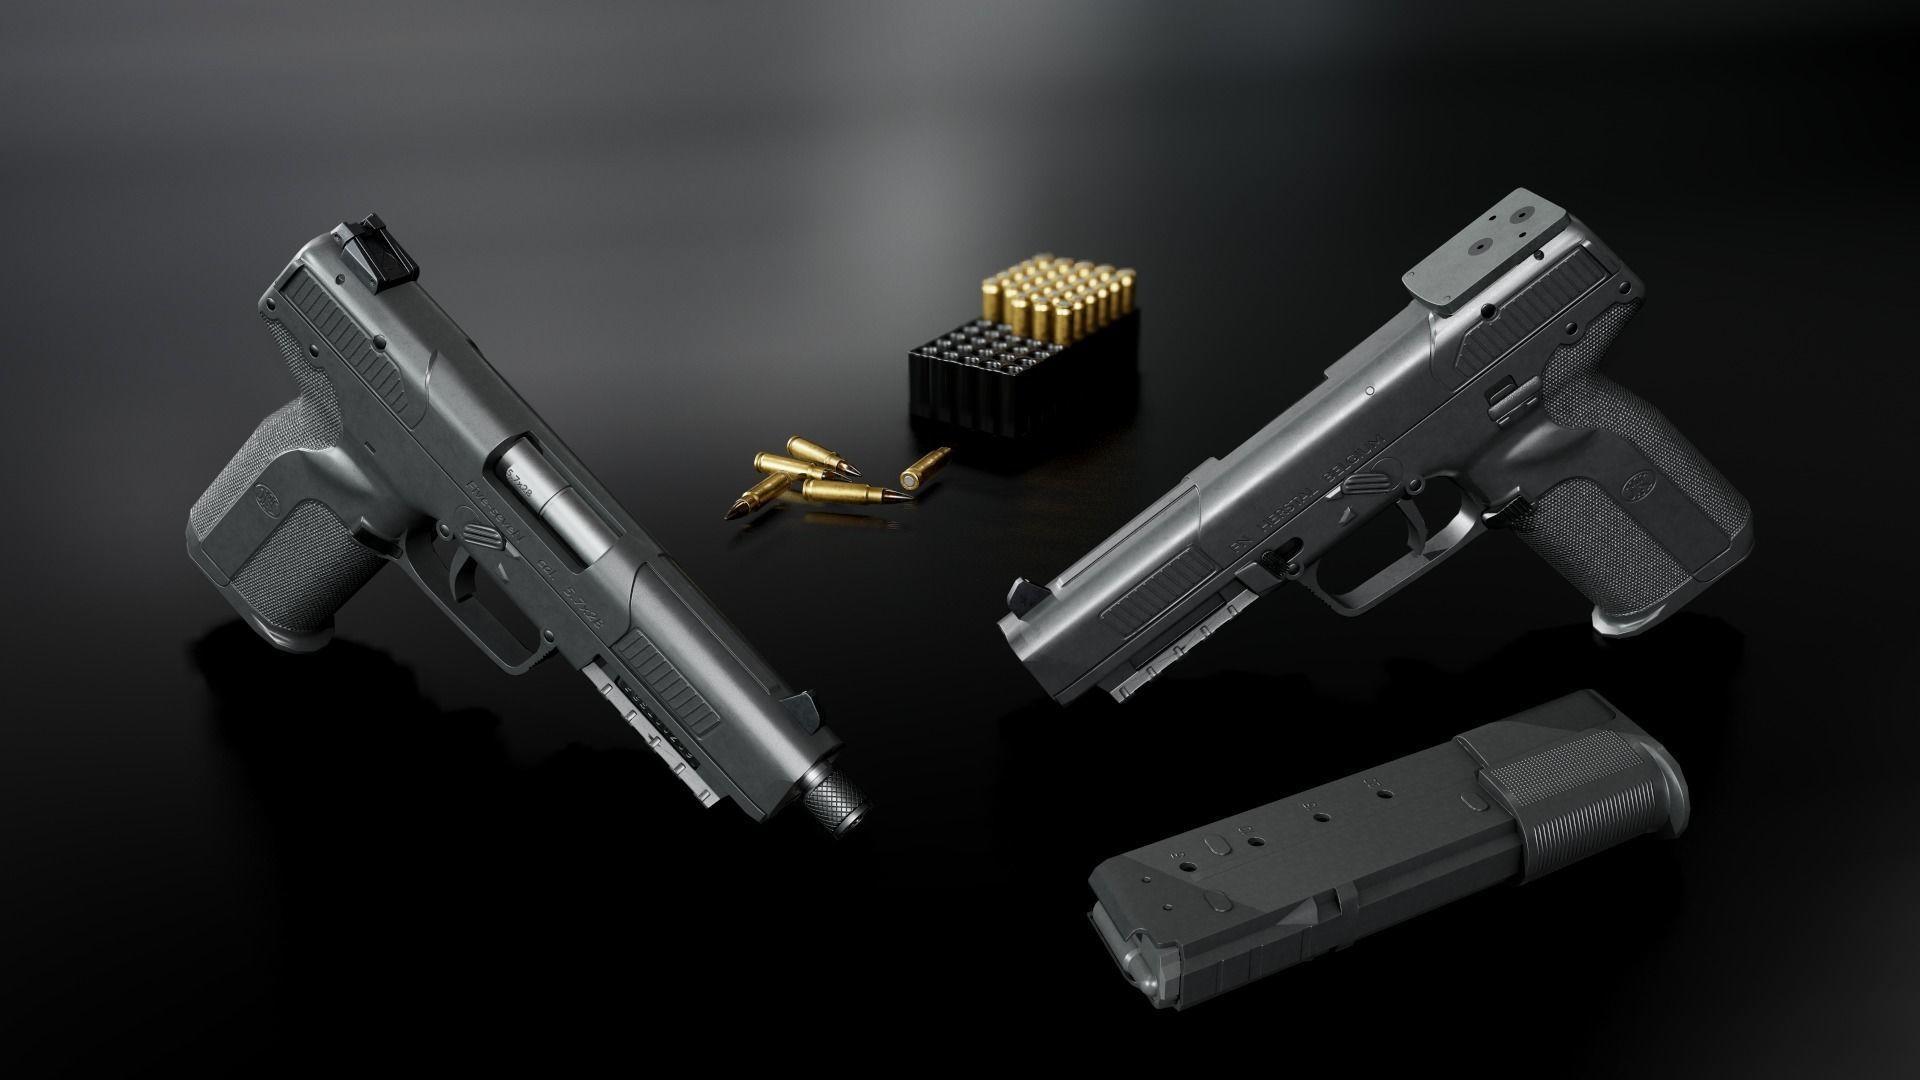 FN Five-Seven MK2 Handgun